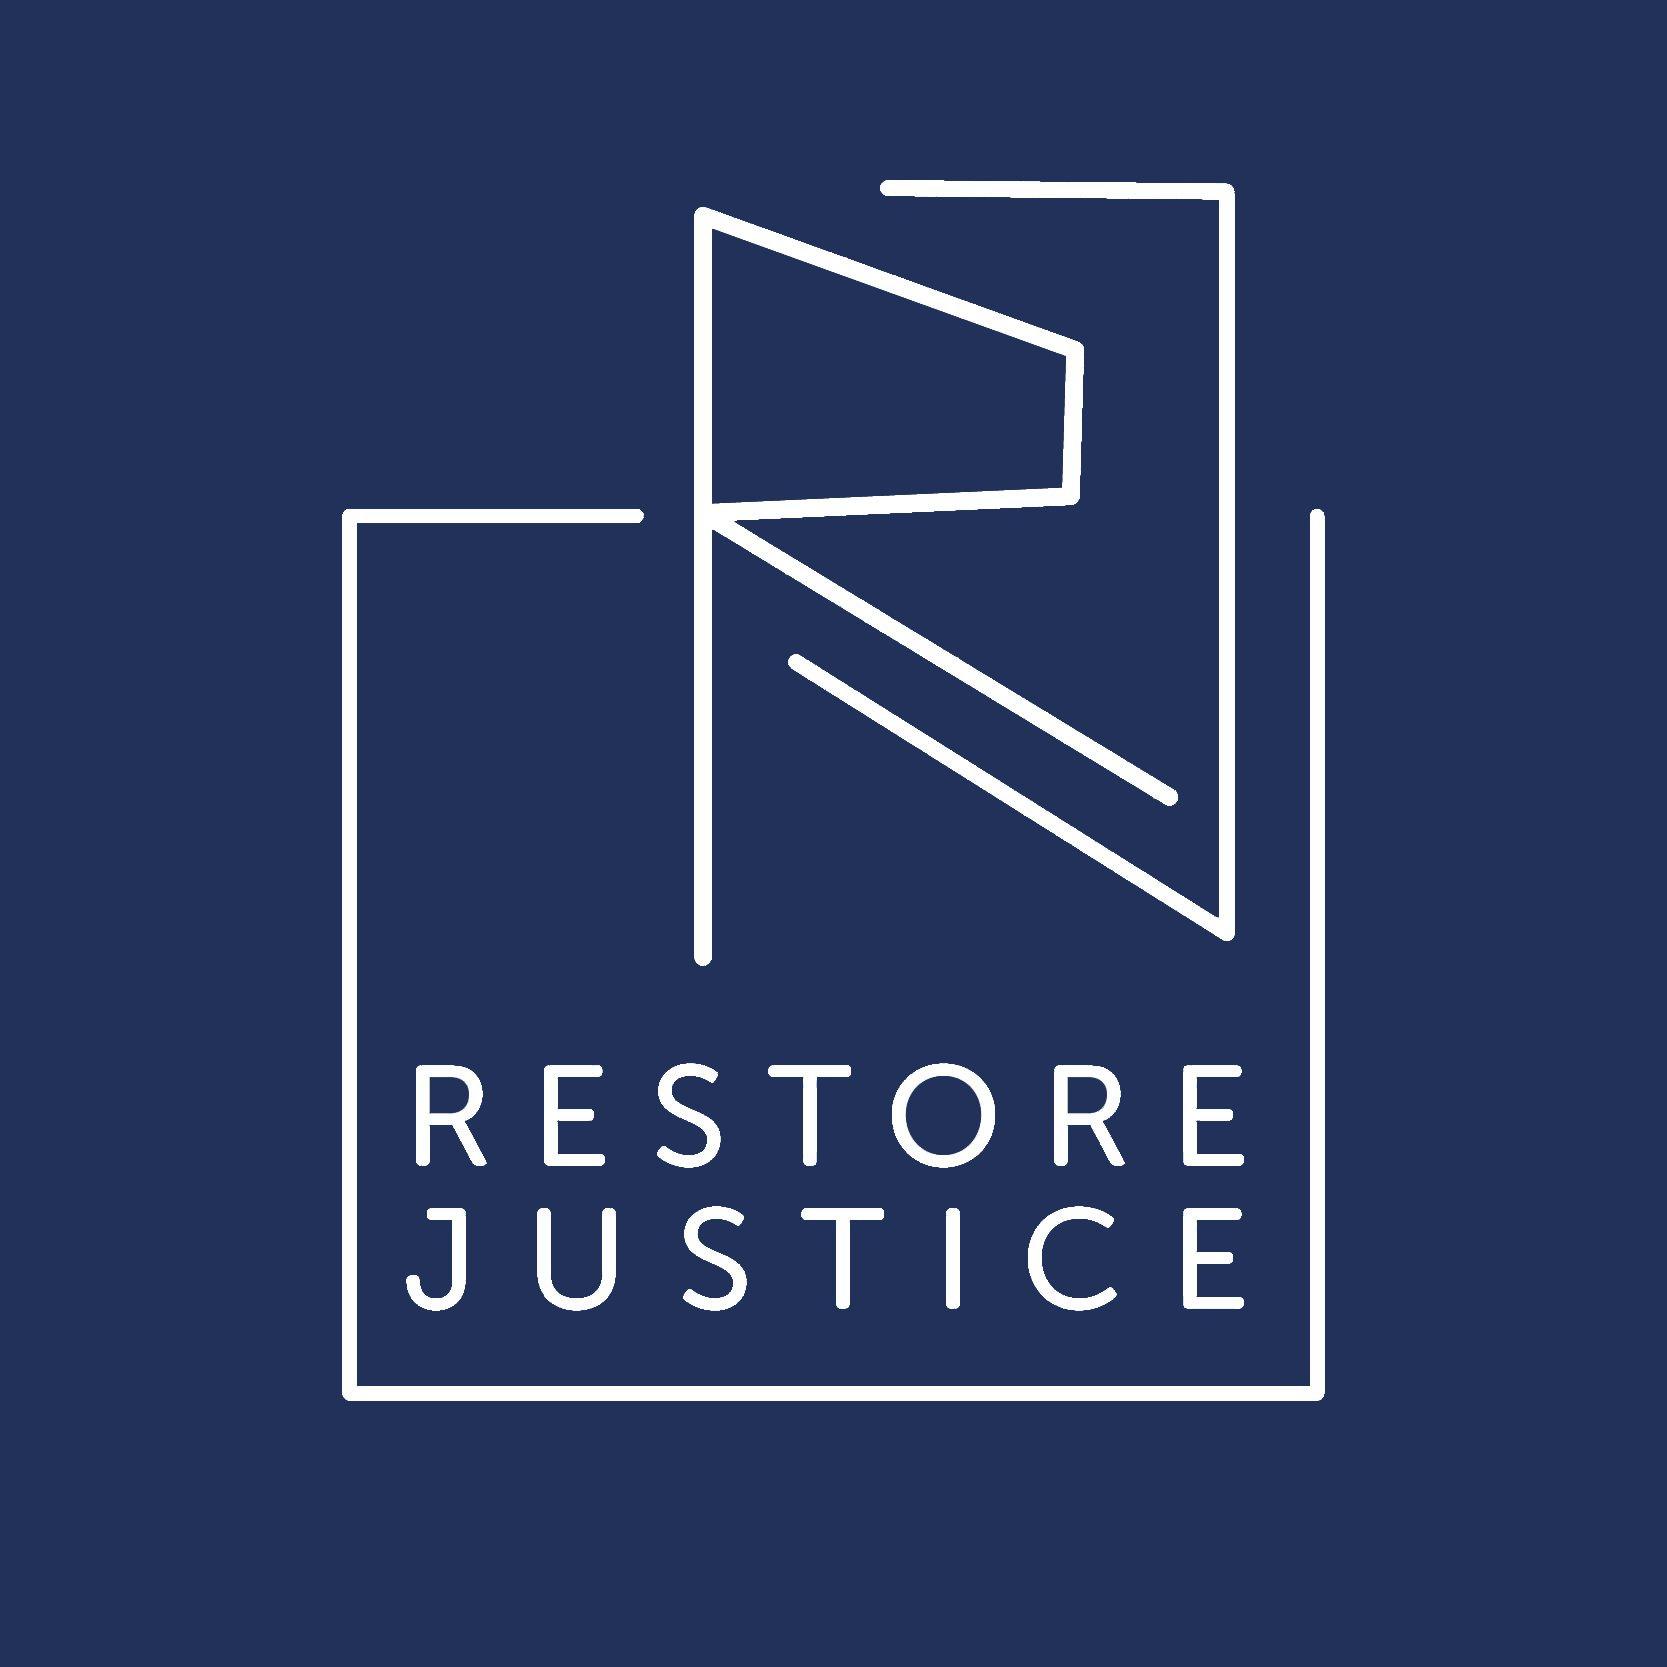 @JusticeRestore